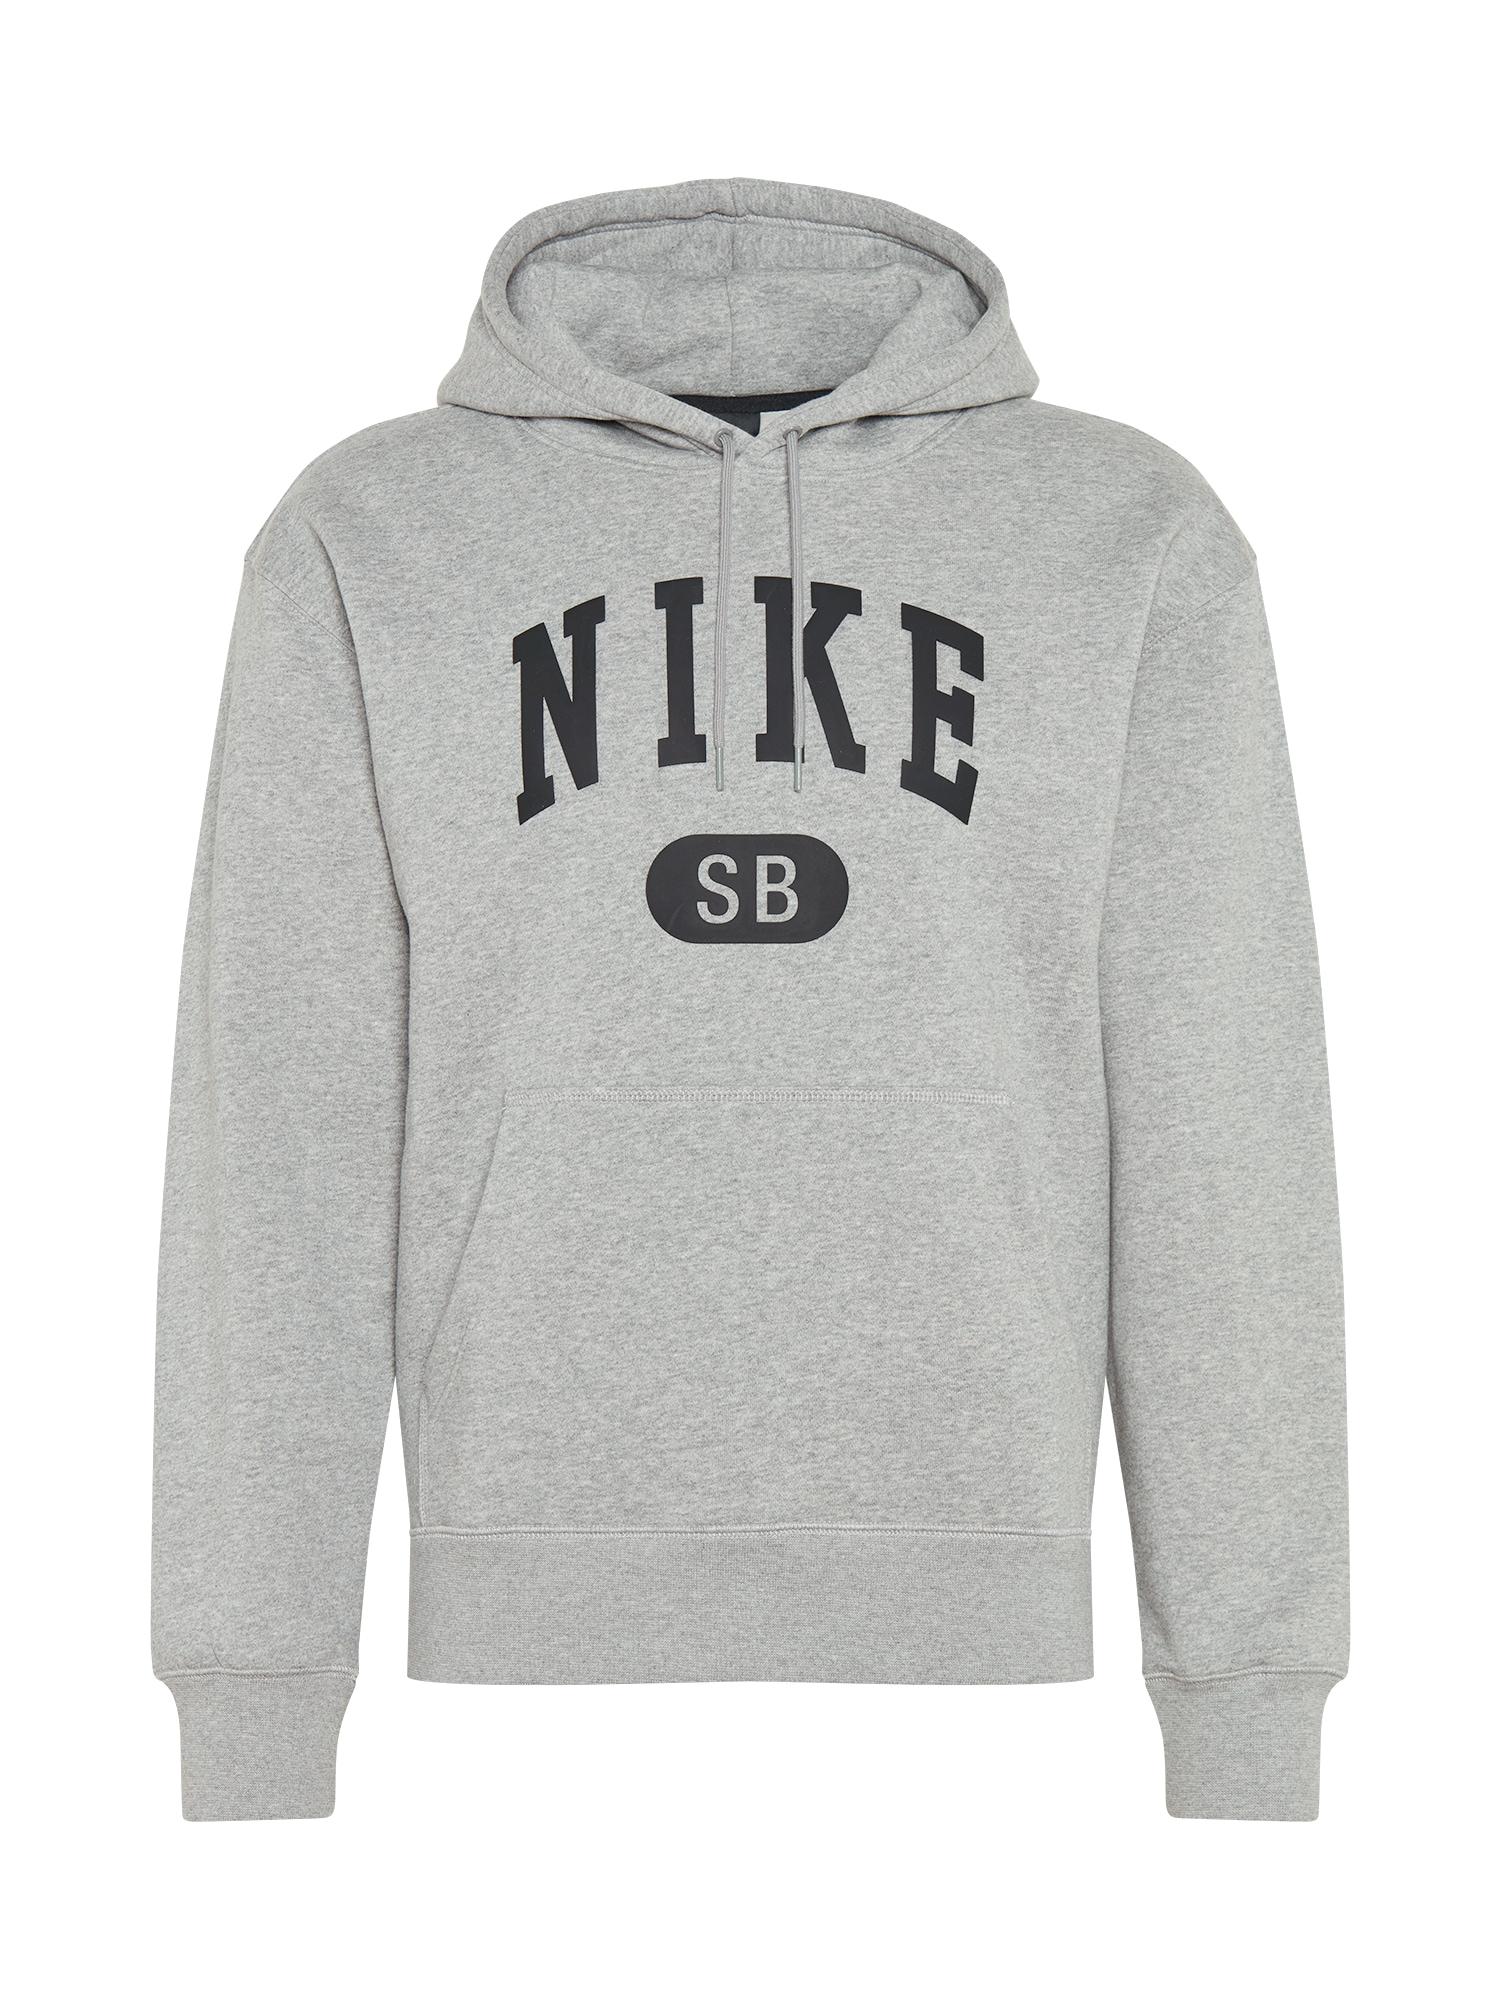 Nike SB Megztinis be užsegimo margai pilka / juoda